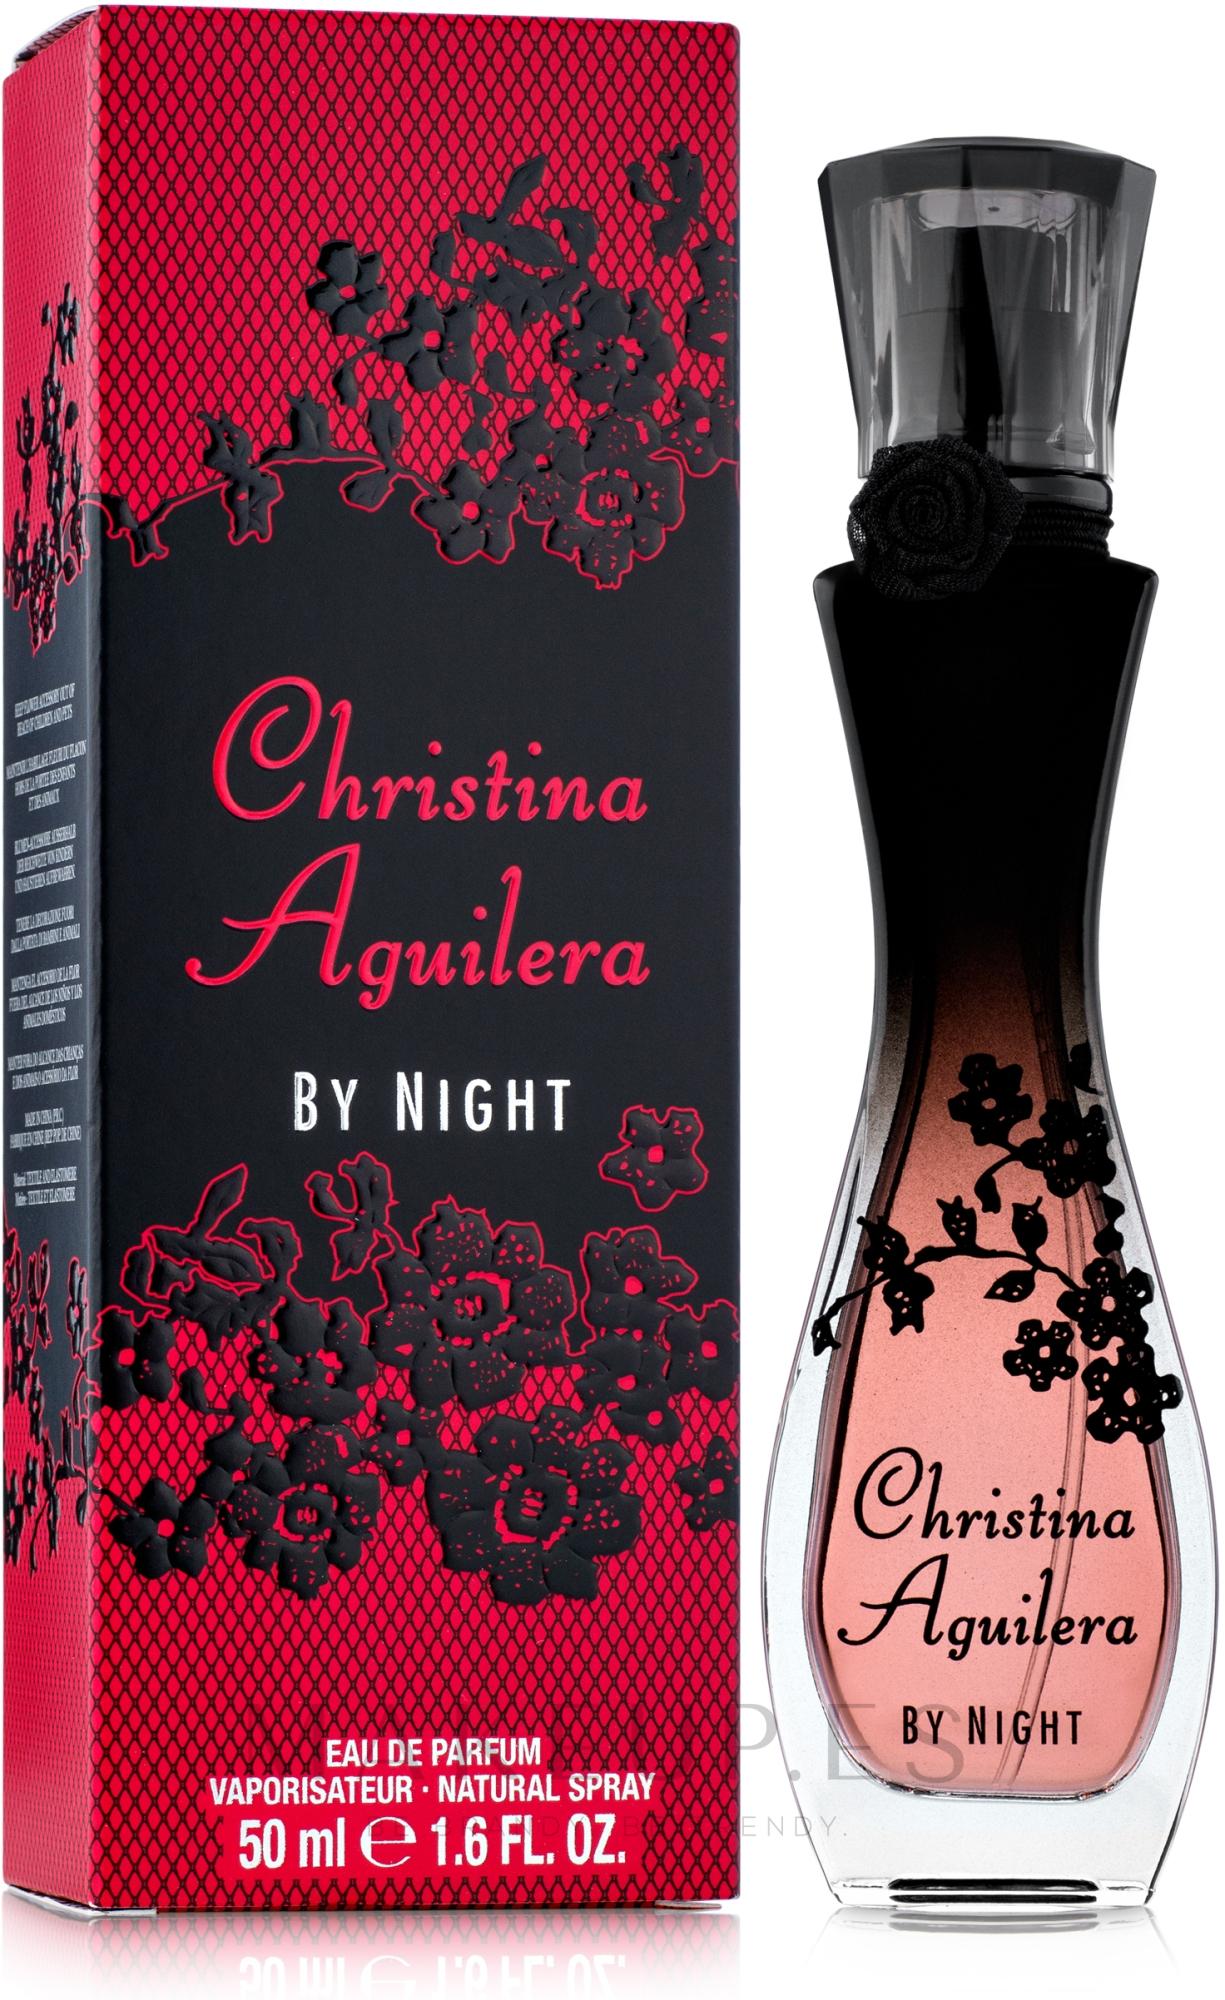 Christina Aguilera by Night - Eau de parfum — imagen 50 ml